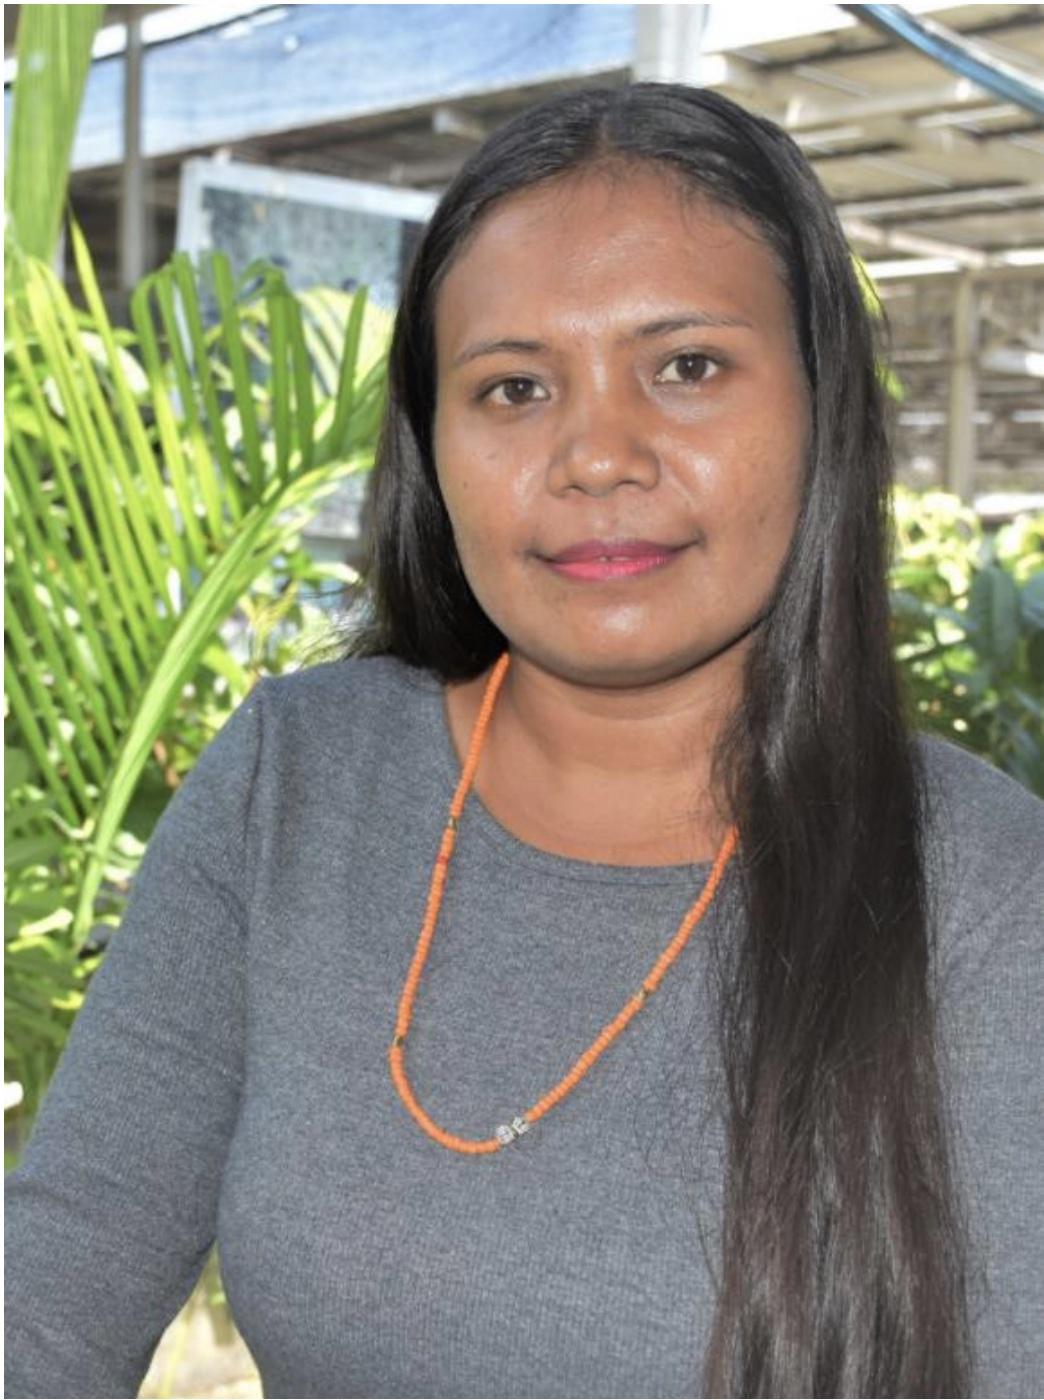 Esmenia Laura Ximenes, the Executive Director for Timor-Leste Young Women's Group (GFFTL). Photo: UN Women_Helio Miguel